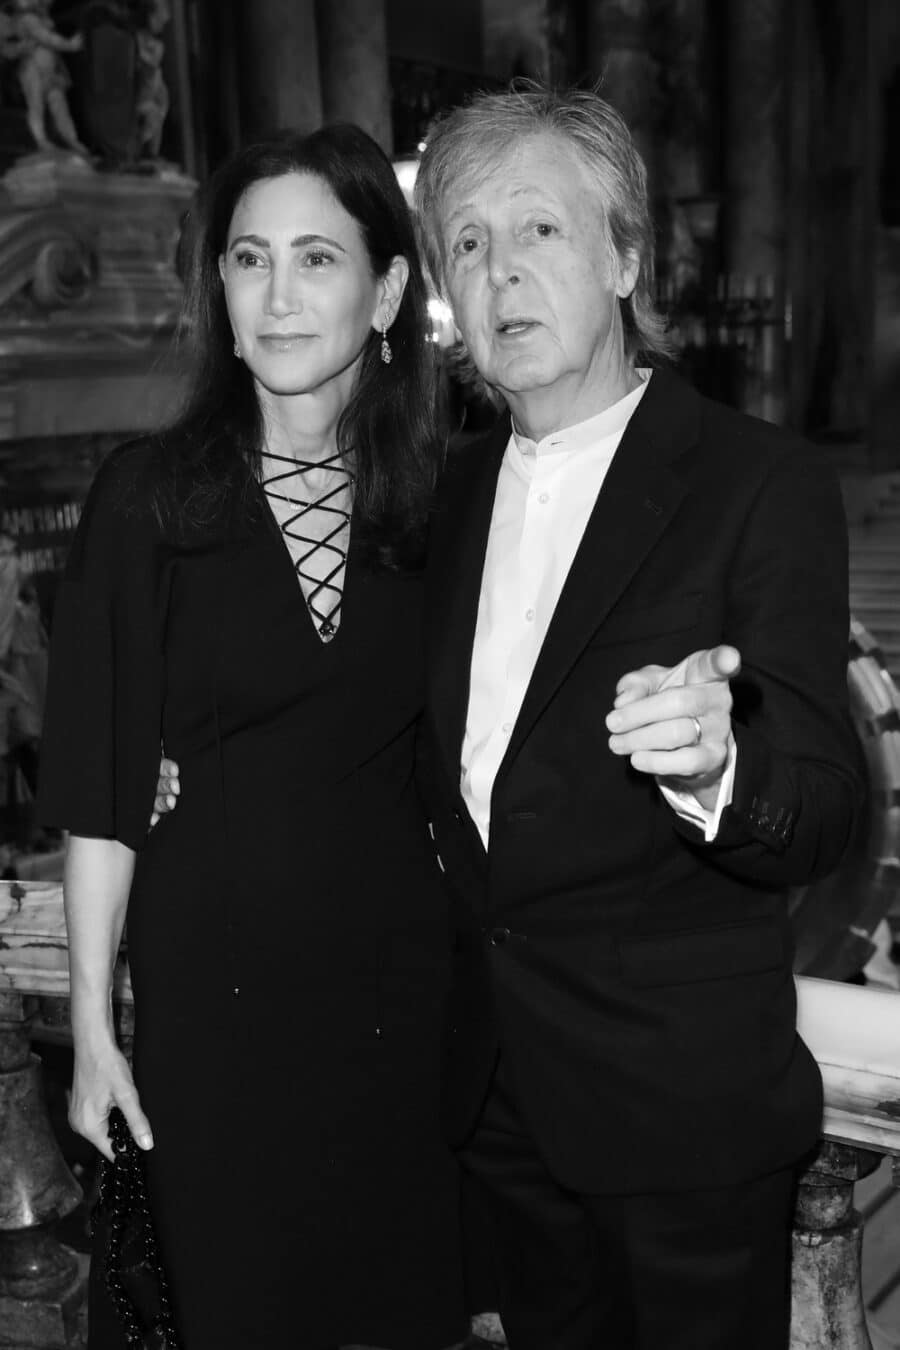 Nancy Shevell & Paul McCartney